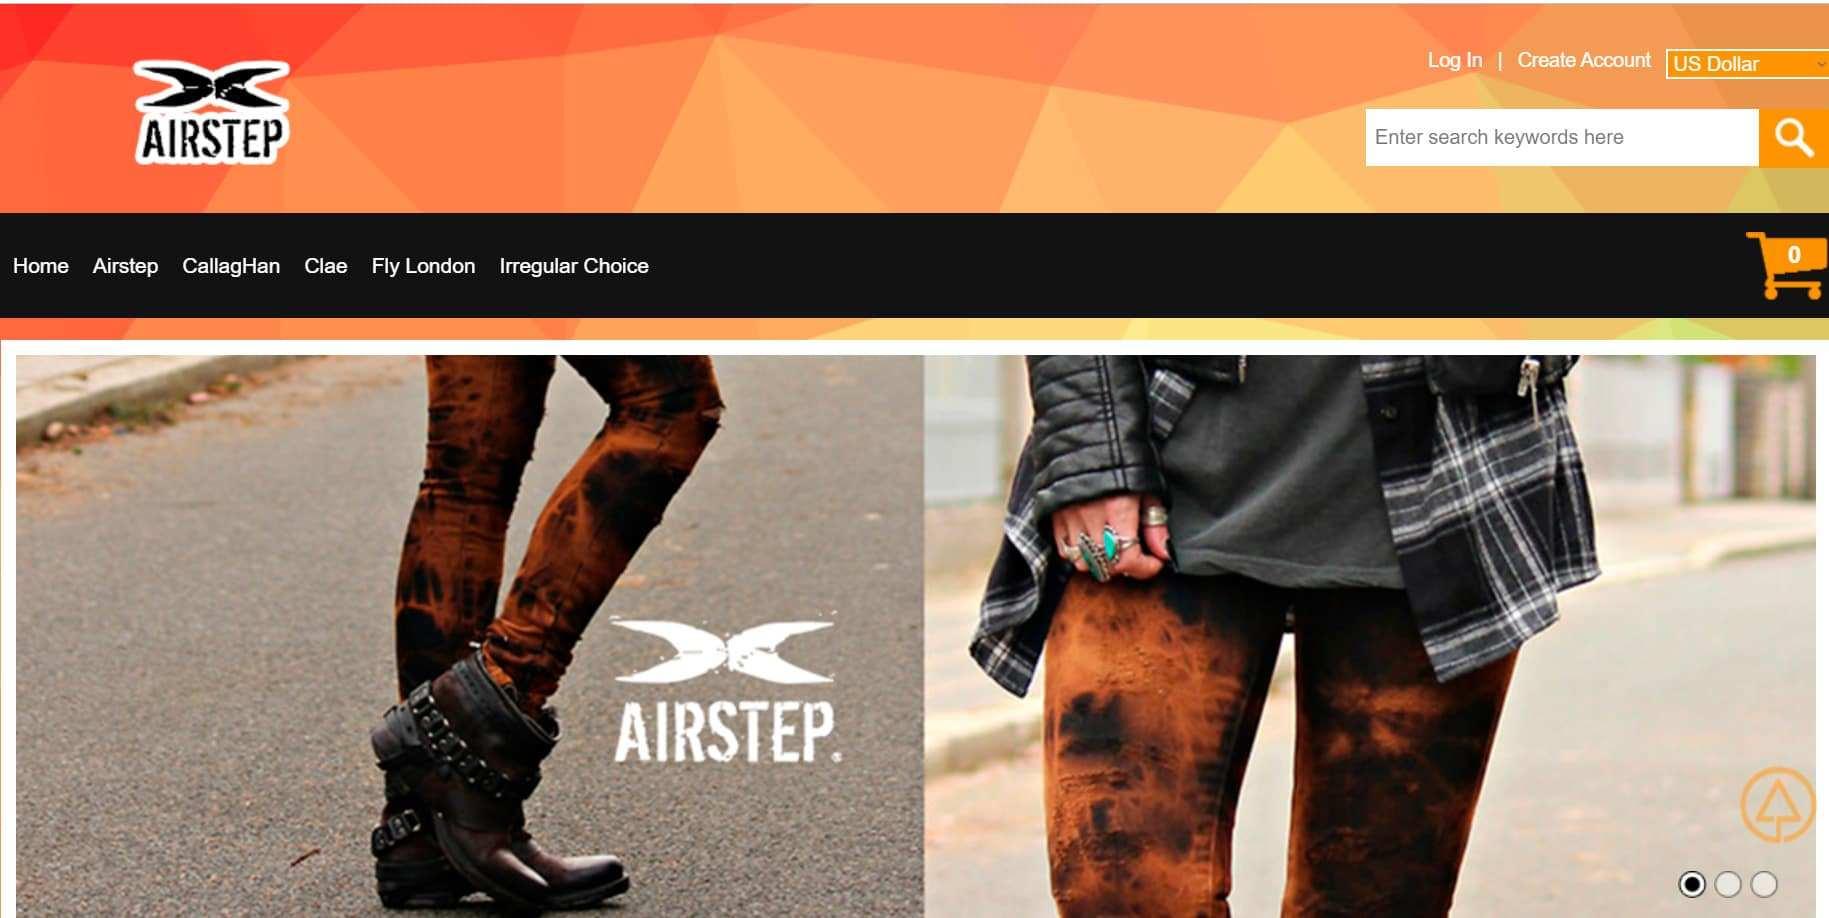 Consettsafcsa.com Tienda Falsa Online Airstep